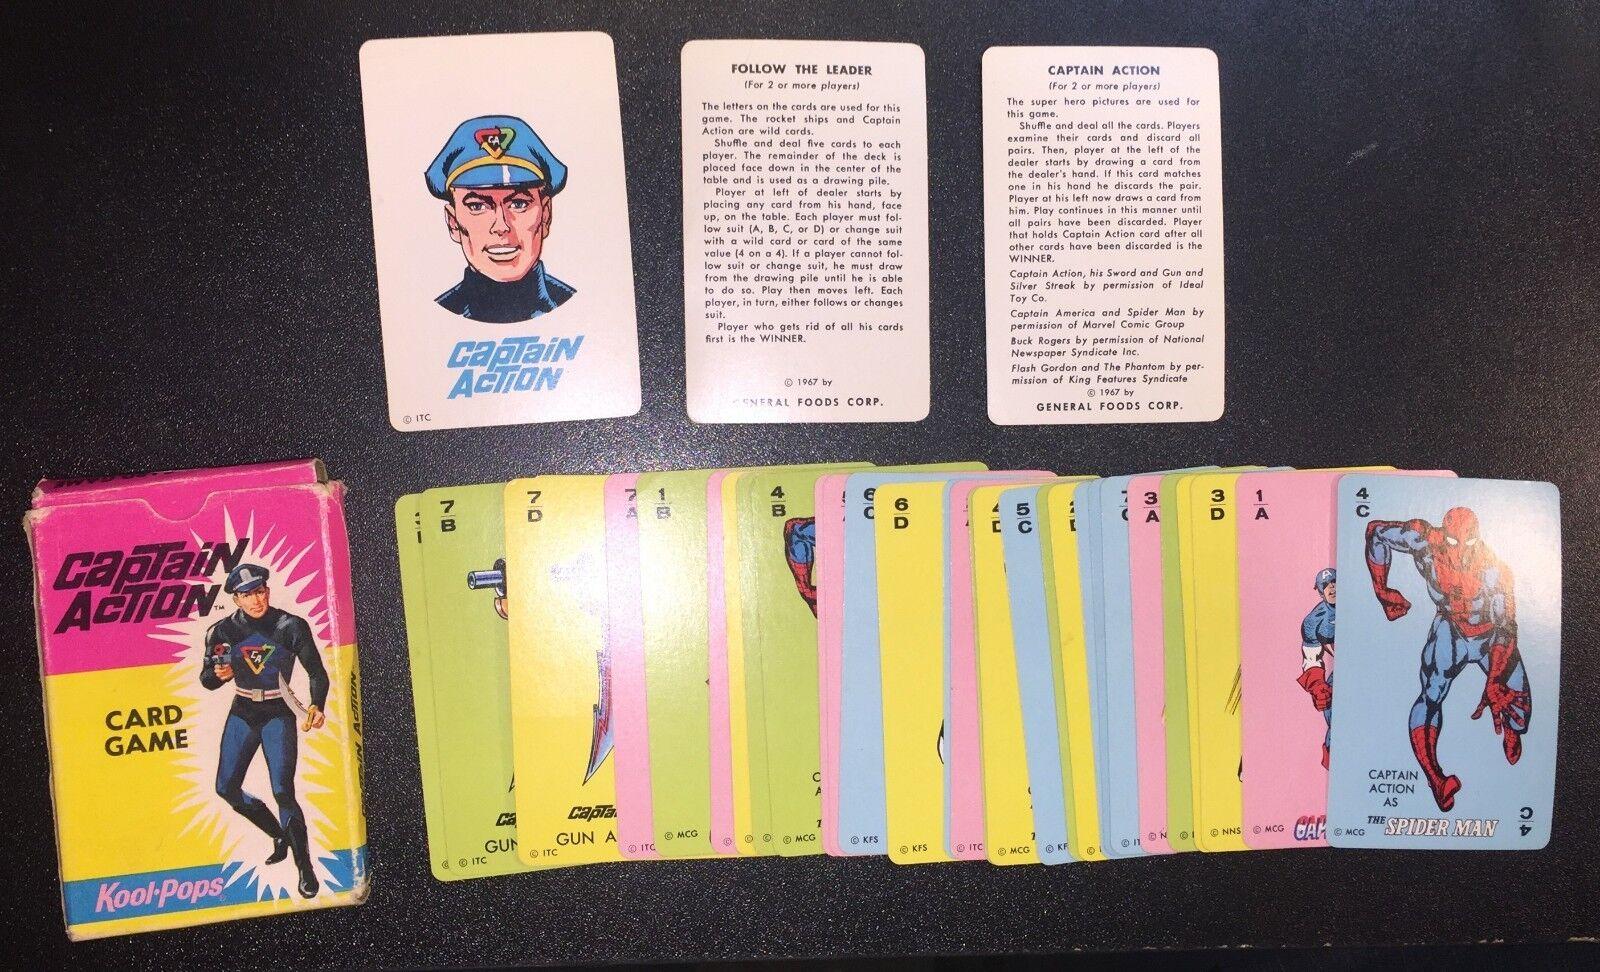 Captain aktion kartenspiel 1967 kool - pops original box 3 karten fehlen